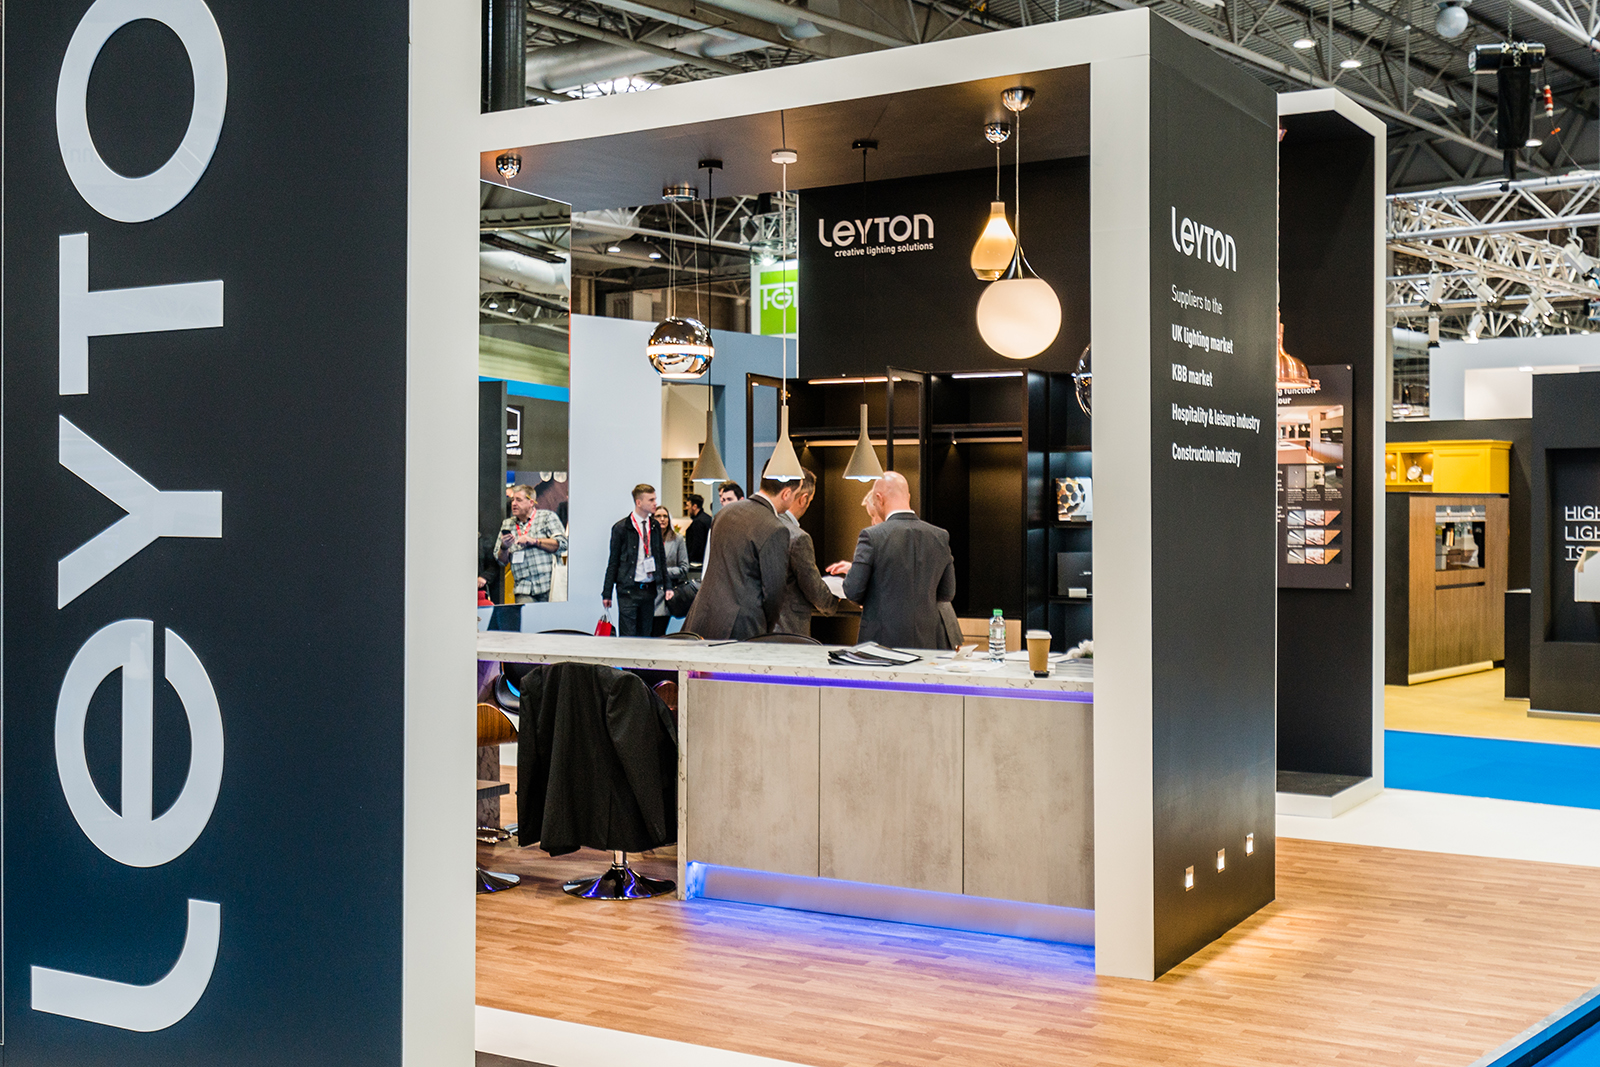 D Exhibition Uk : Leyton lighting kbb hu d exhibition design